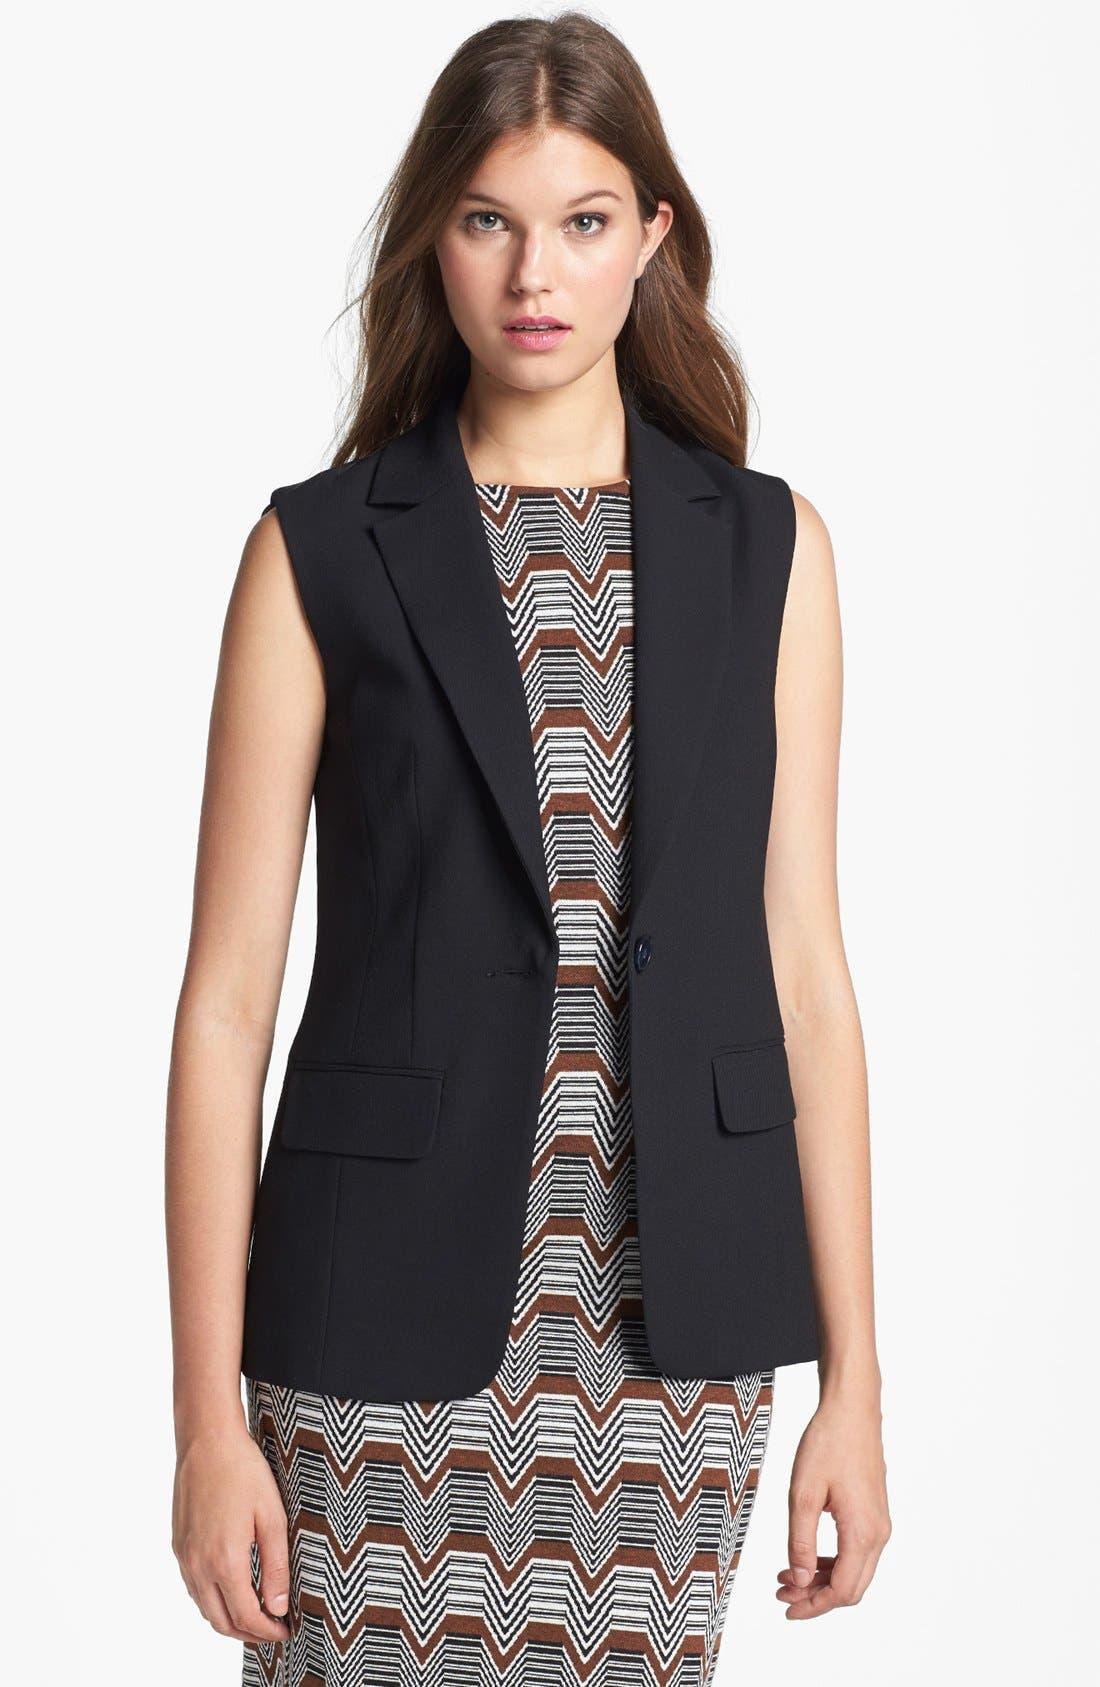 Main Image - Trina Turk 'Desia' Sleeveless Jacket